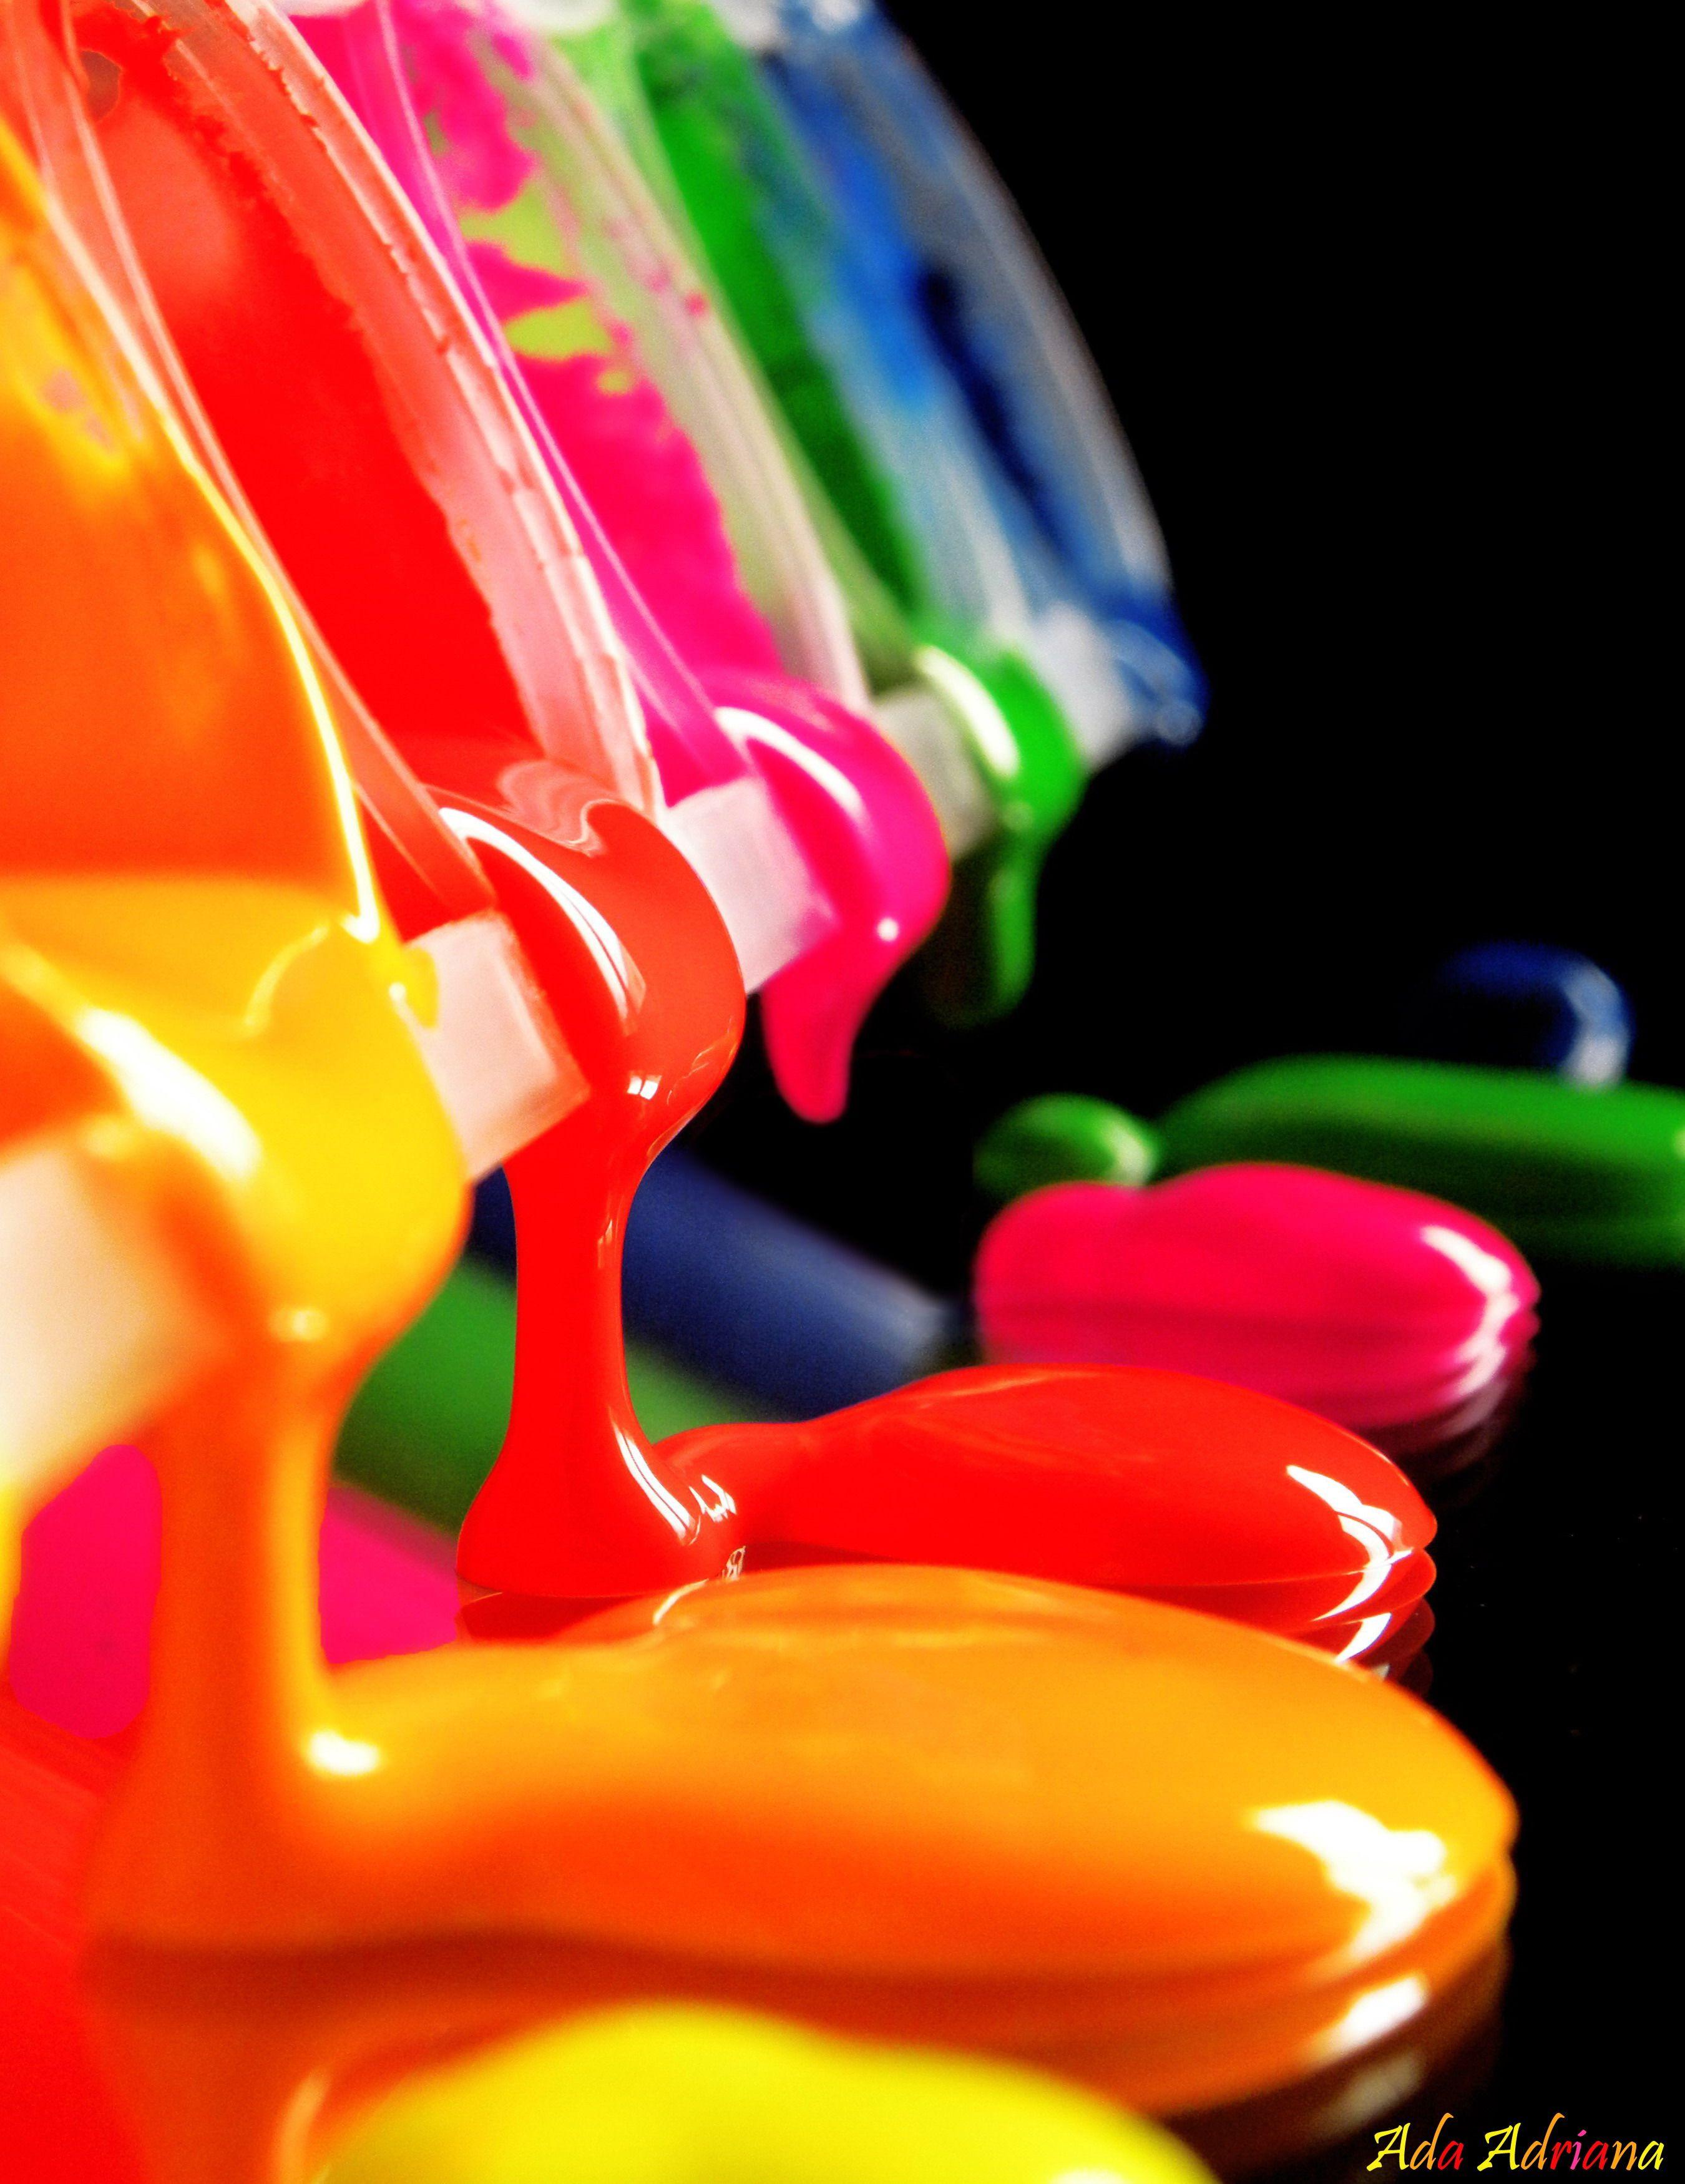 colors - Google Search   General   Pinterest   Acrylics, Watercolor ...